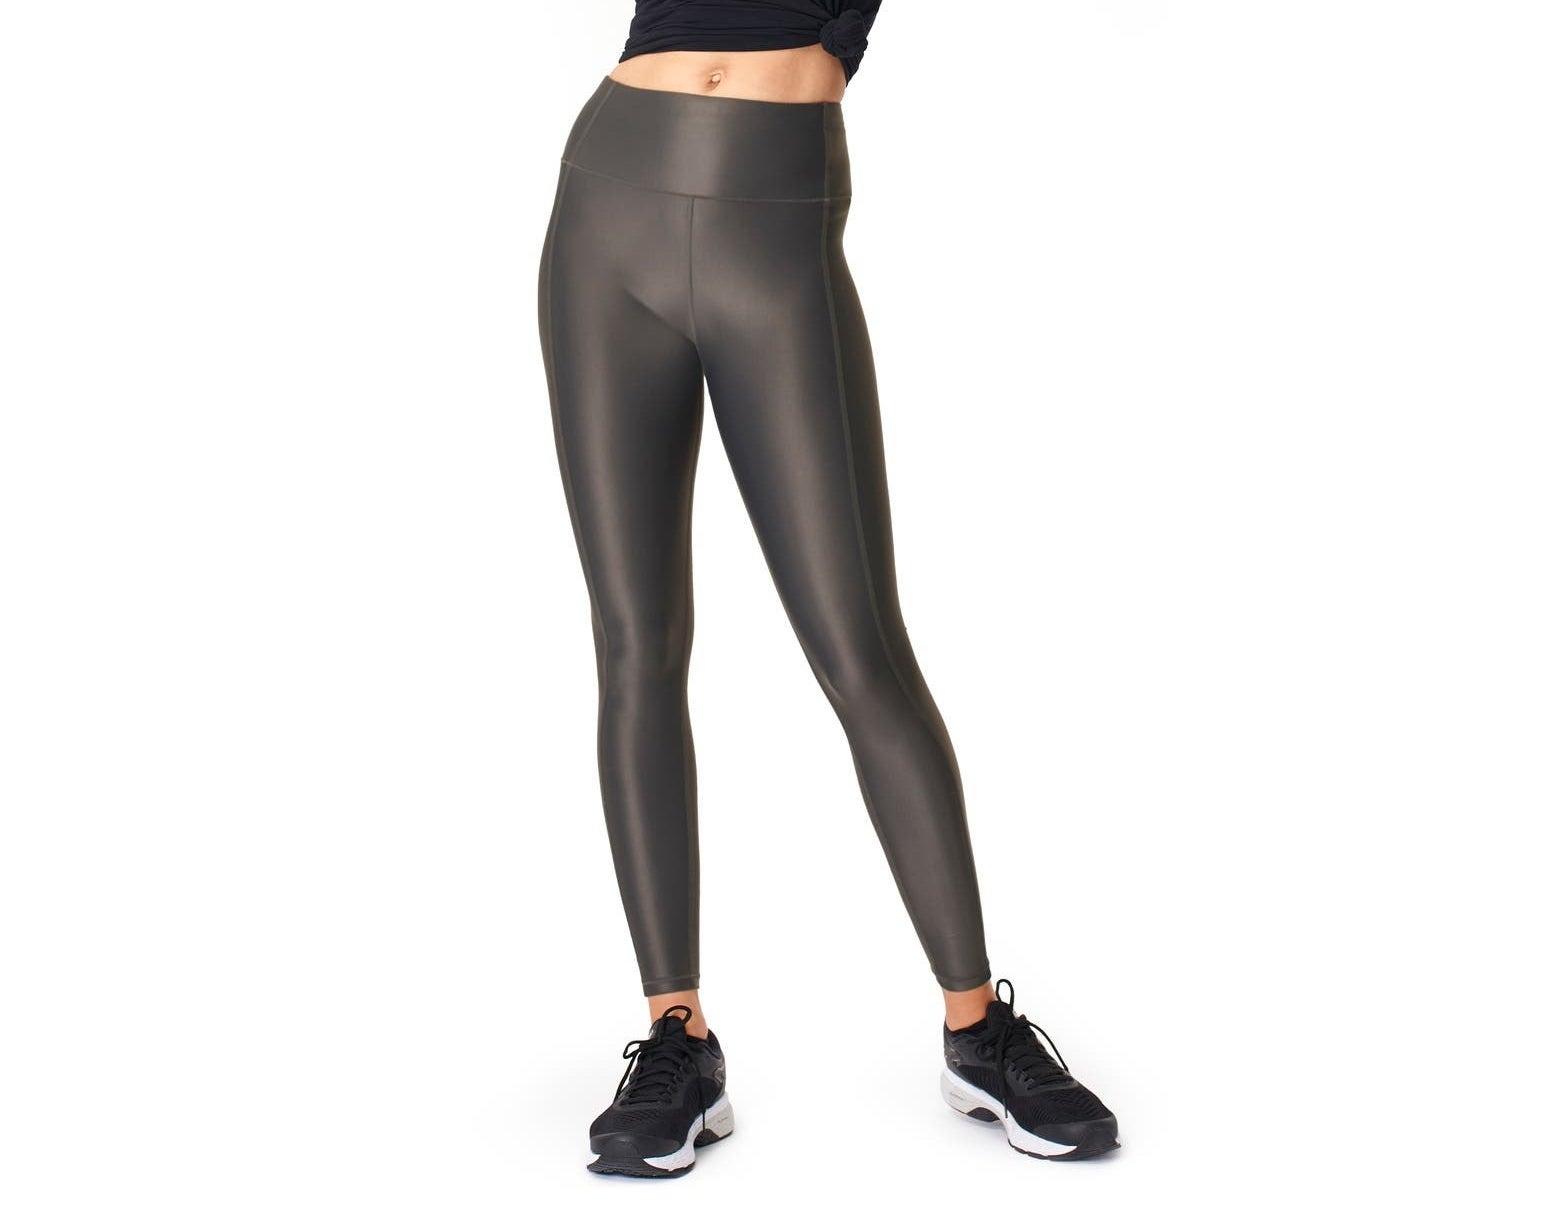 Model wearing the shiny black leggings